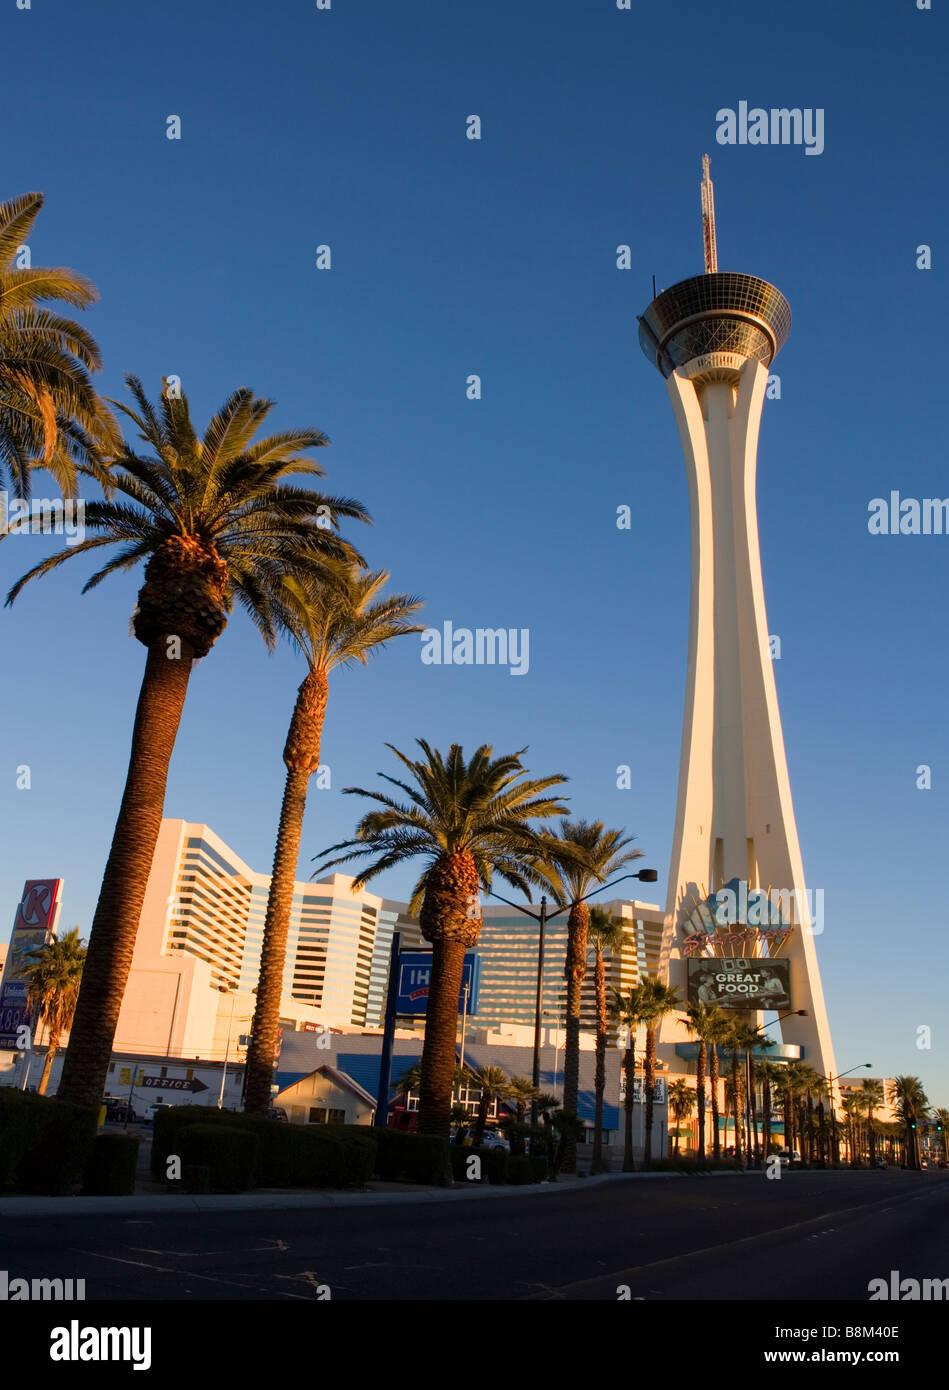 Stratosphere Hotel and Casino on the Las Vegas strip at Sunrise, Nevada, USA - Stock Image